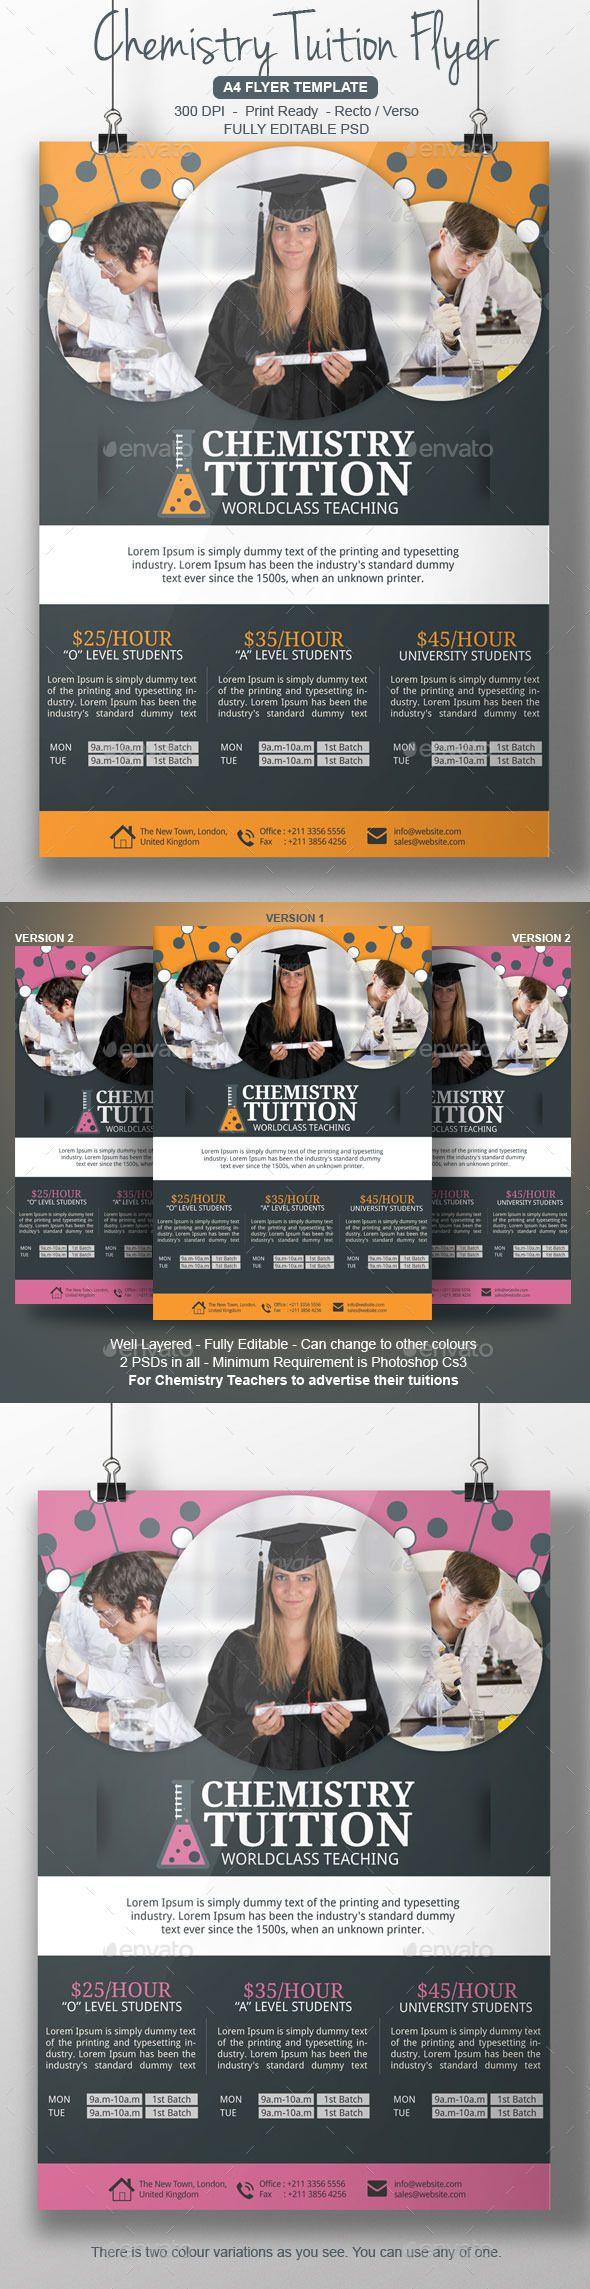 chemistry tutor flyer template marketing flyers pinterest